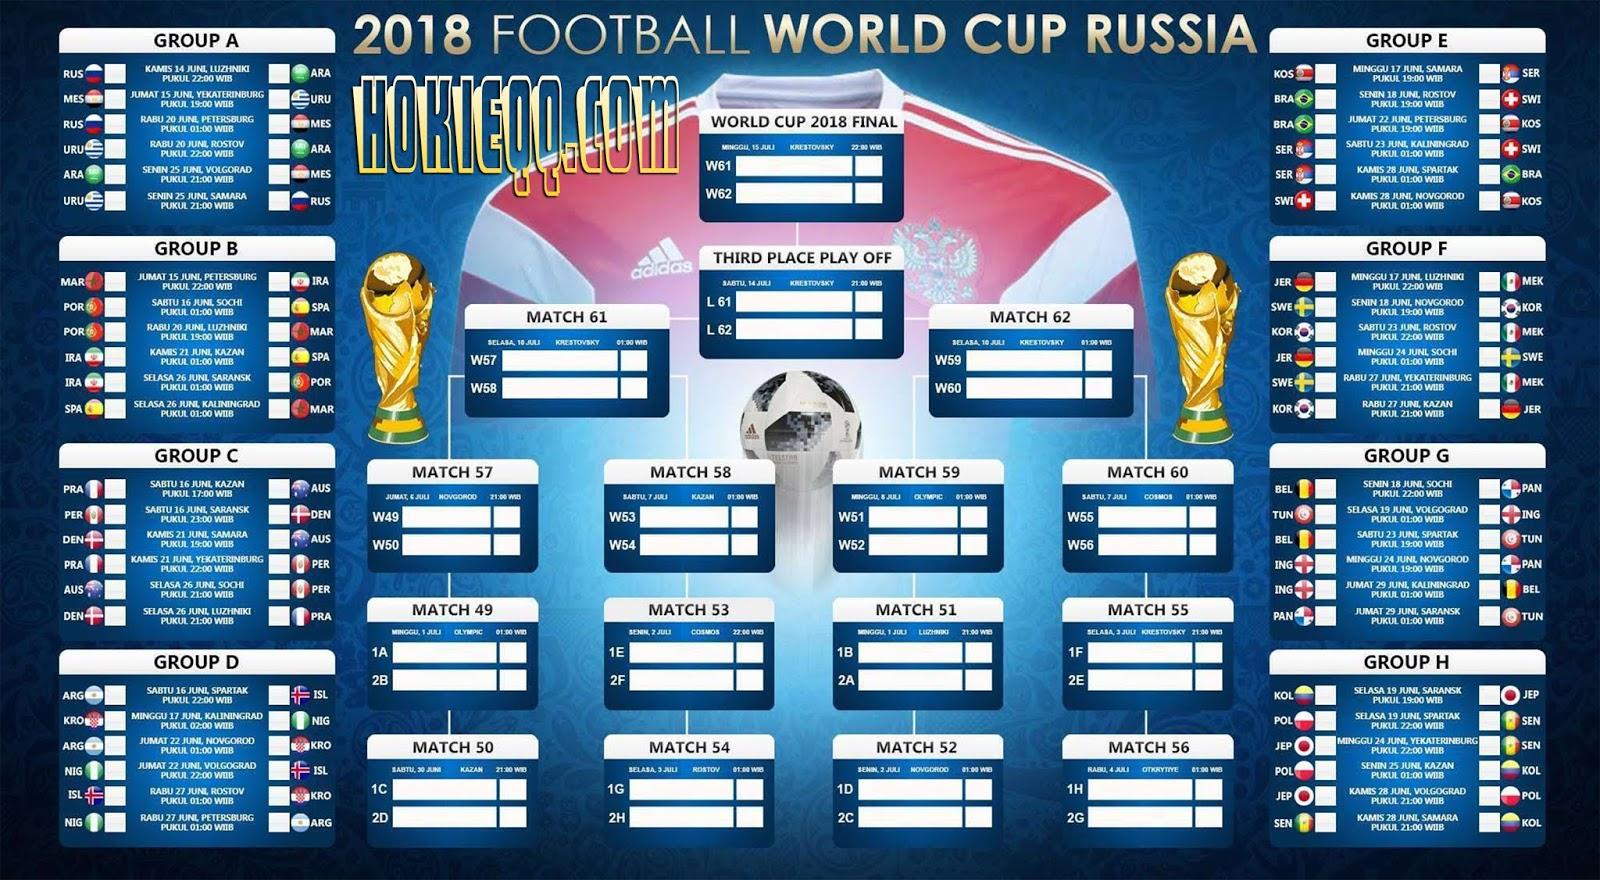 Jadwal Pertandingan Piala Dunia 2018  BalanceQQ  Dunia